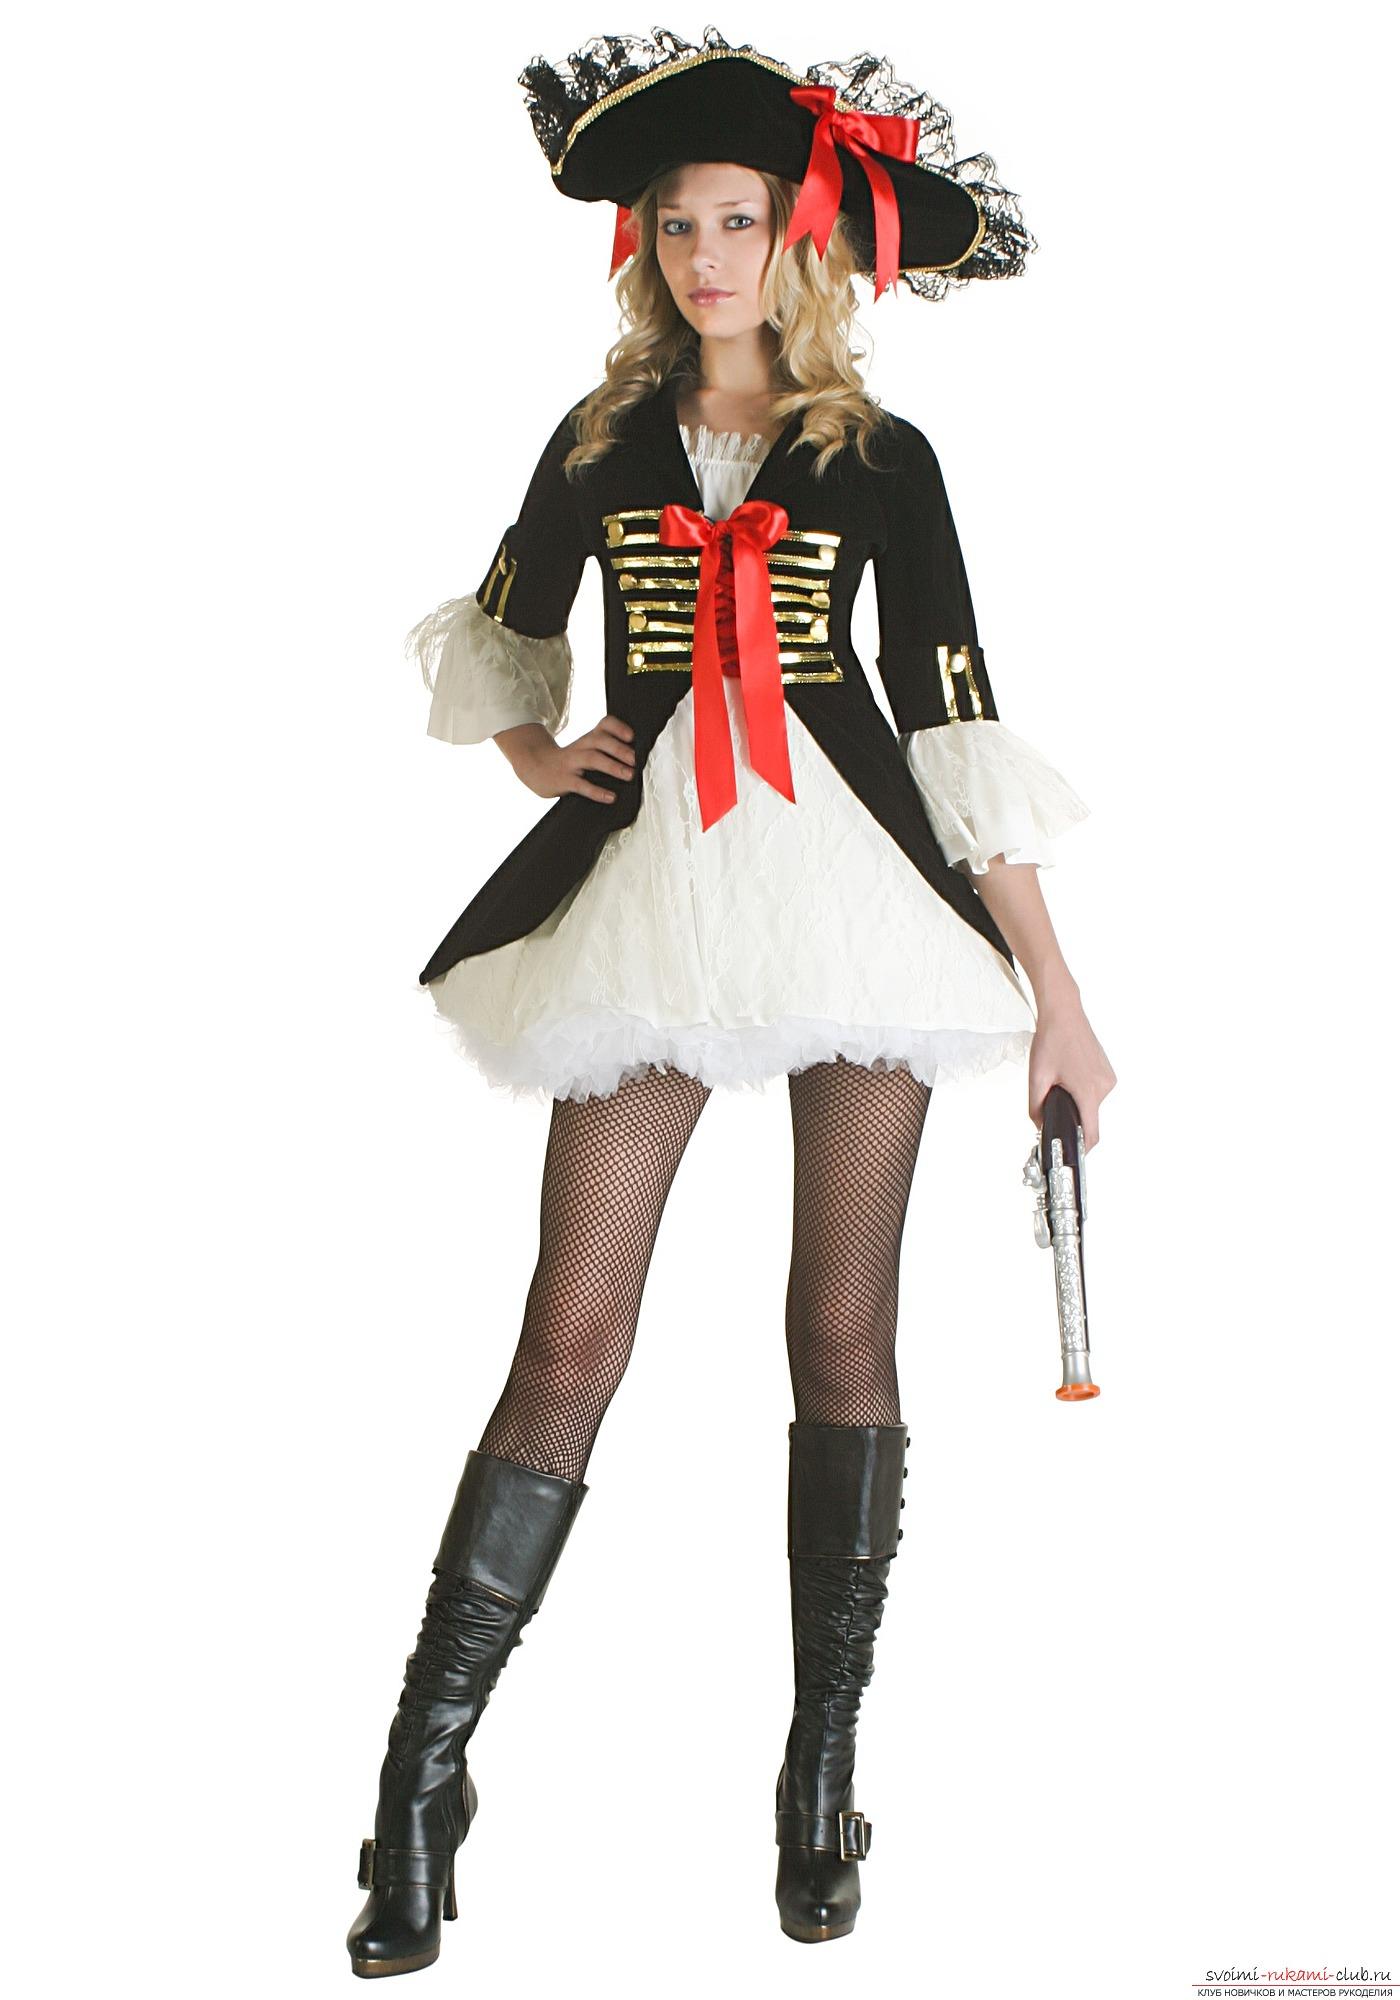 костюм пиратки для взрослы картинки знаменитого